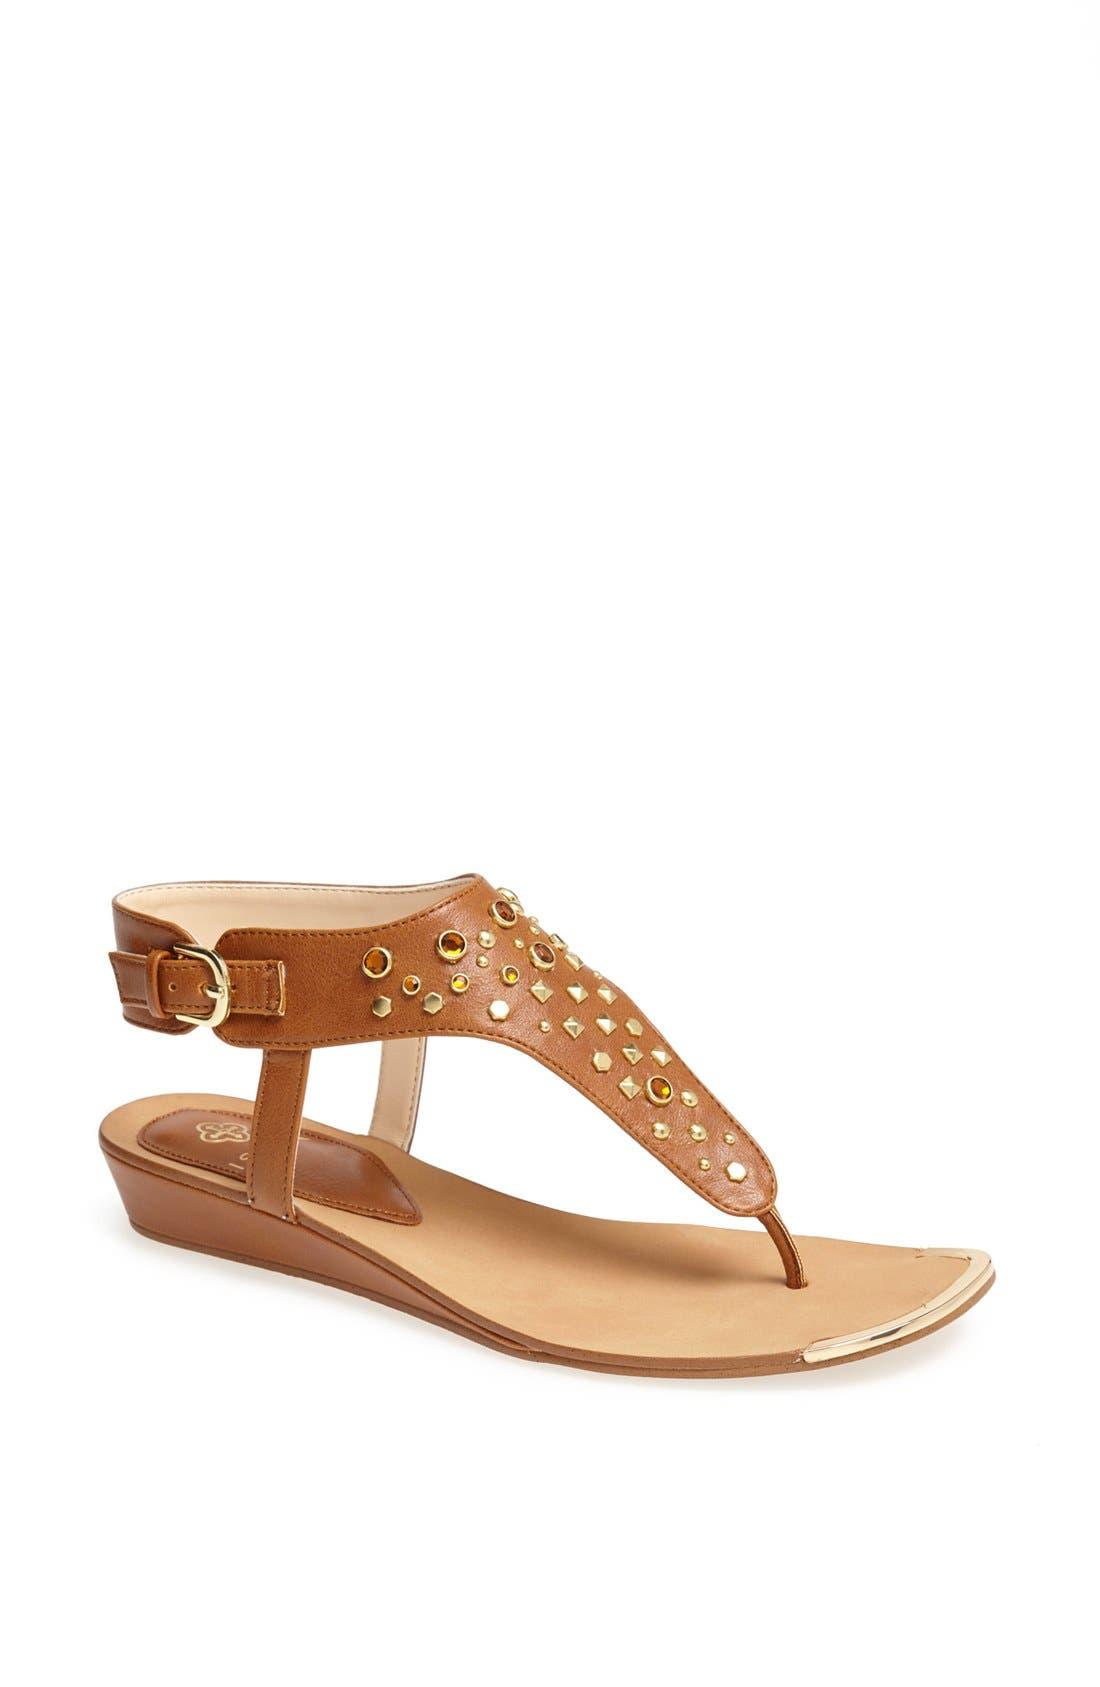 Main Image - Isolá 'Anastasia' Sandal